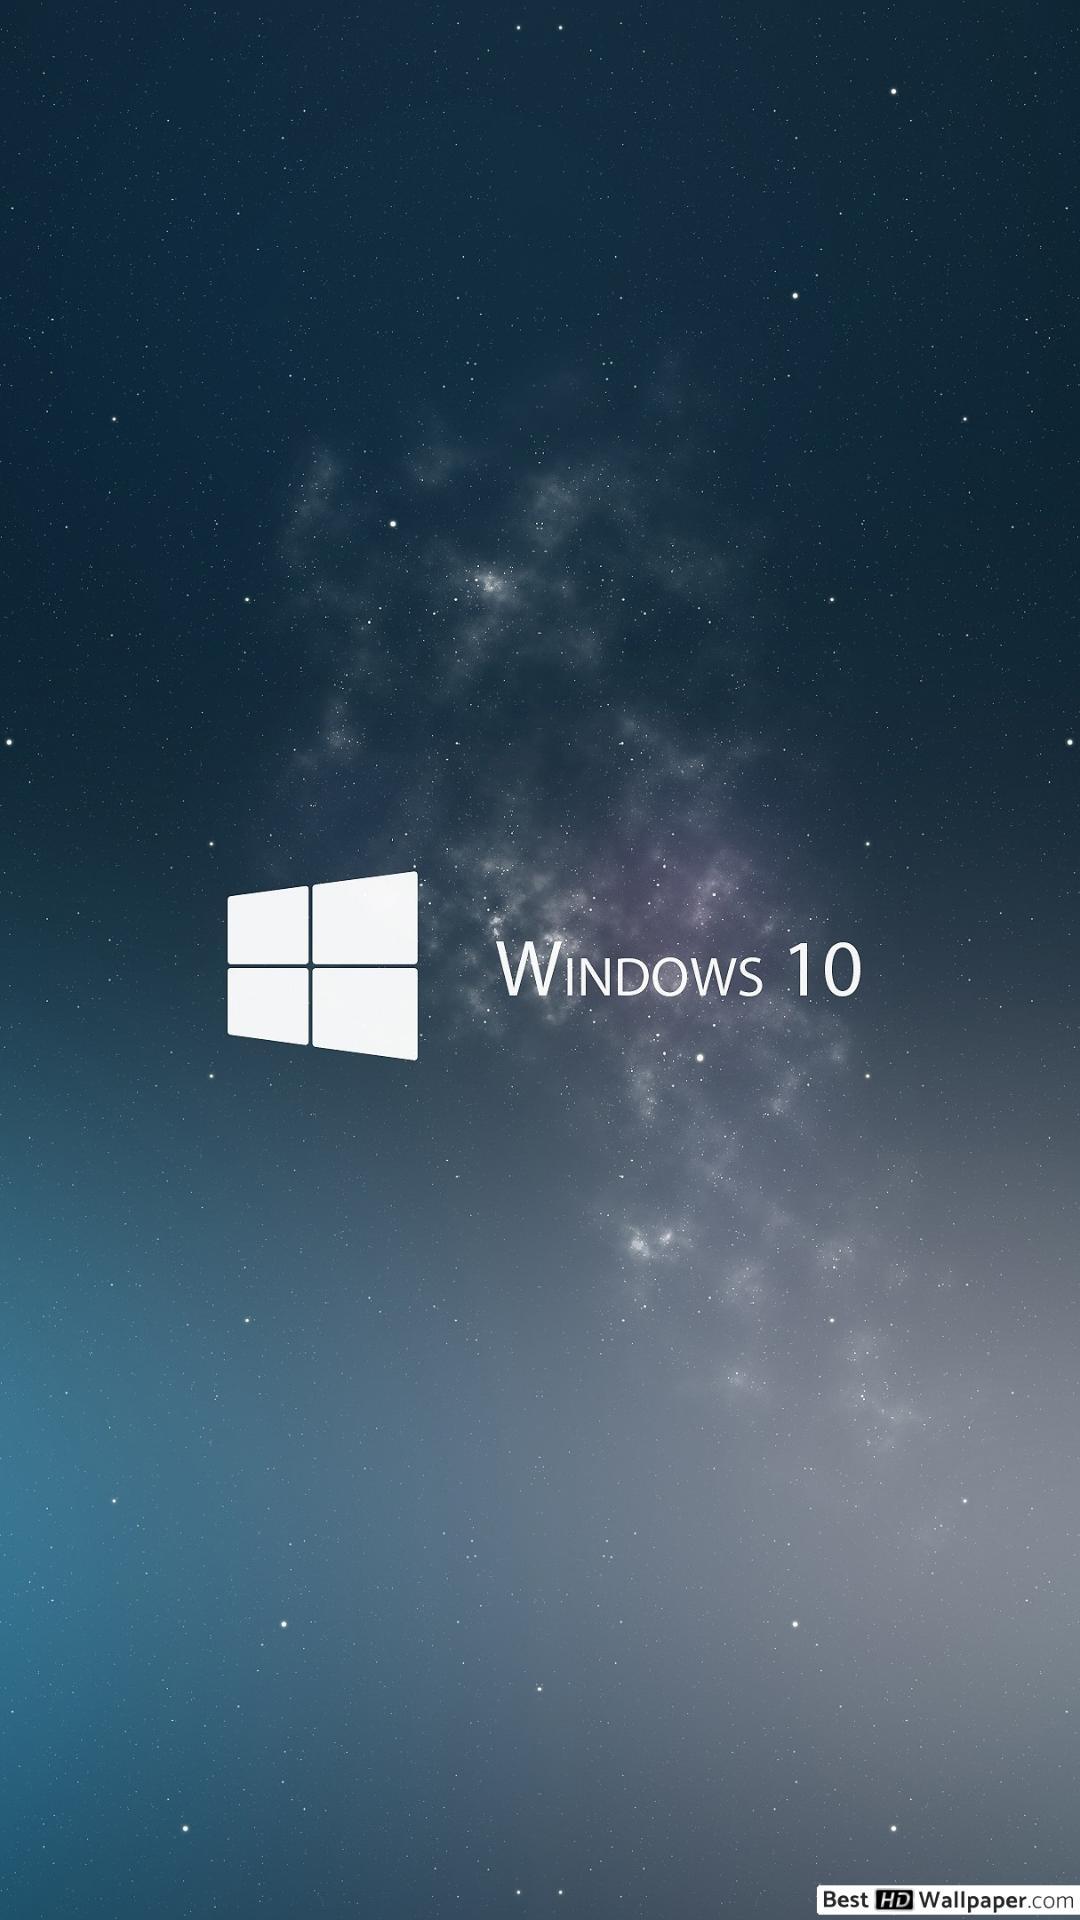 Wallpaper Windows 10, 4k, 5k Wallpaper, Microsoft ...